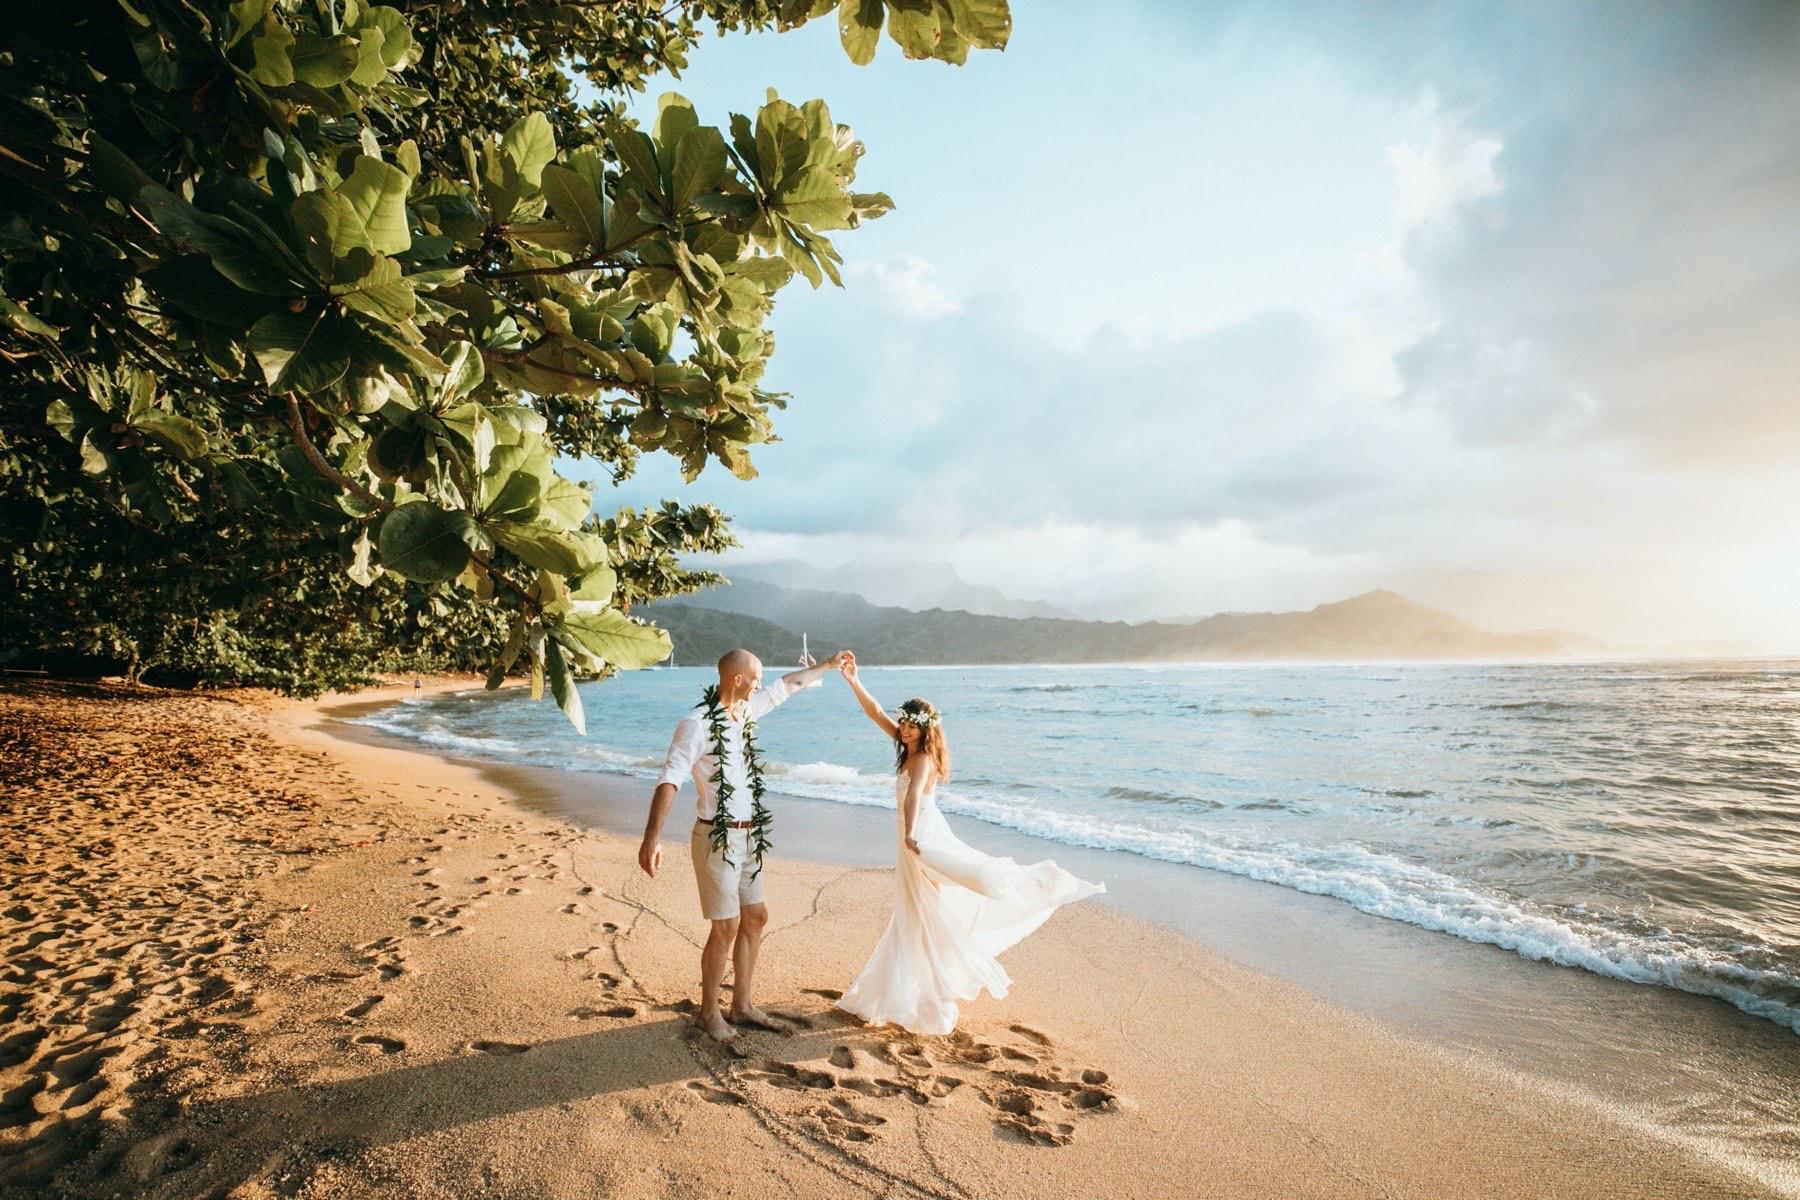 Marina & Sebastian on the beach in Kauai.